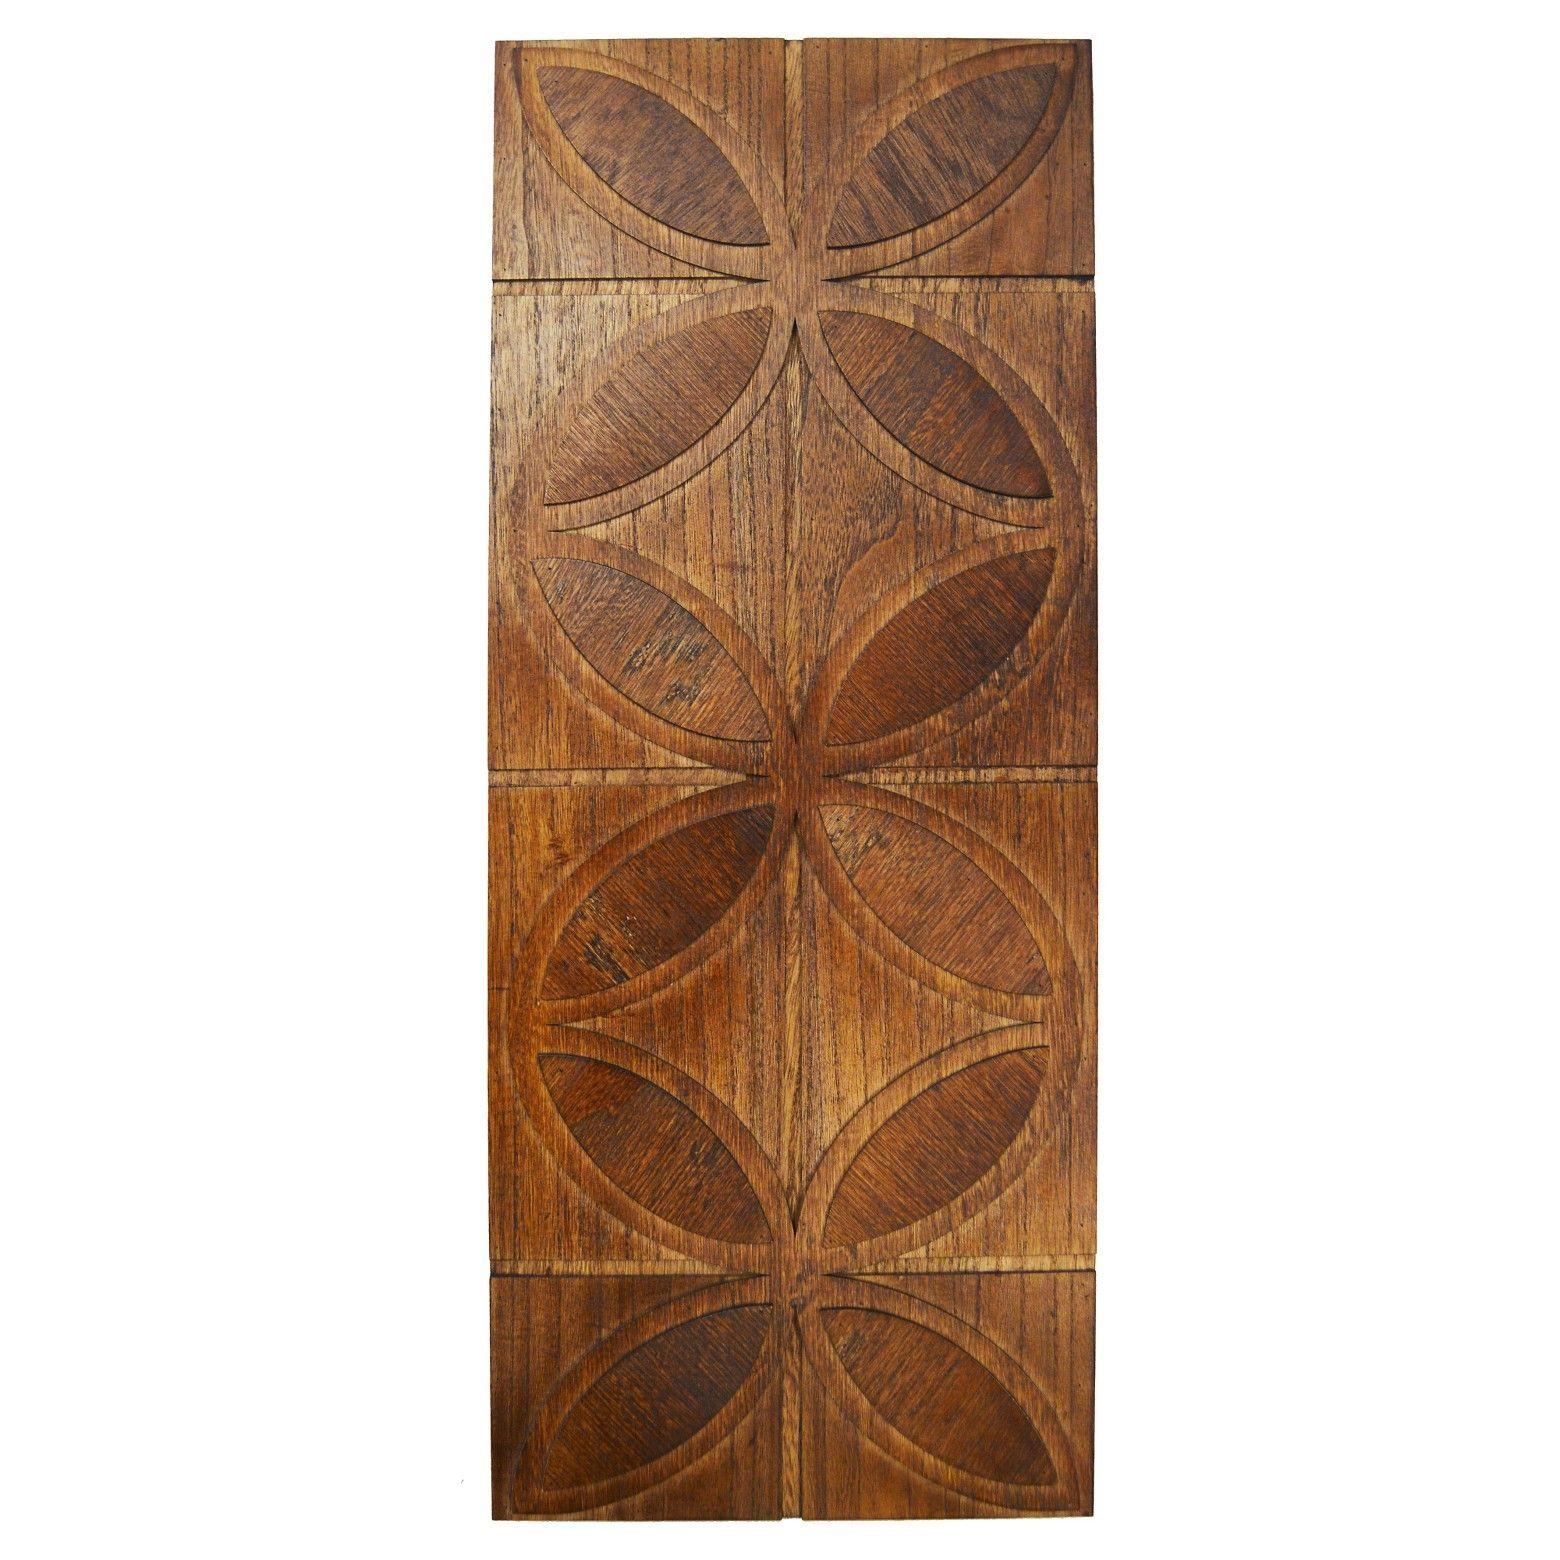 Threshold midcentury pieced wood x pinterest wood panel